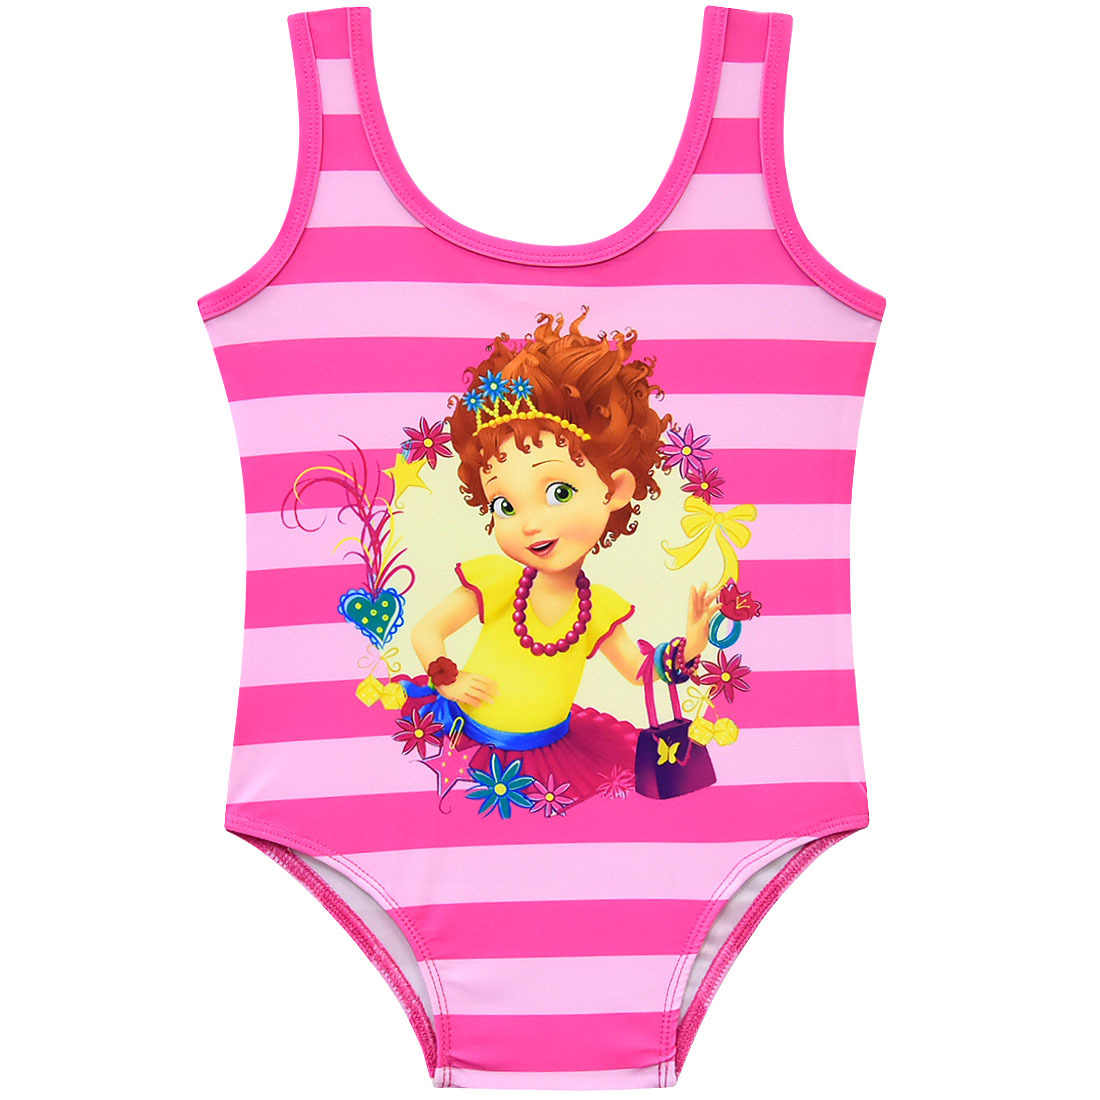 f34bf8cc56 ... New Summer robe fille beautiful fancy nancy Girls Beach Style dress  vaiana Bikini one piece Swimwear ...